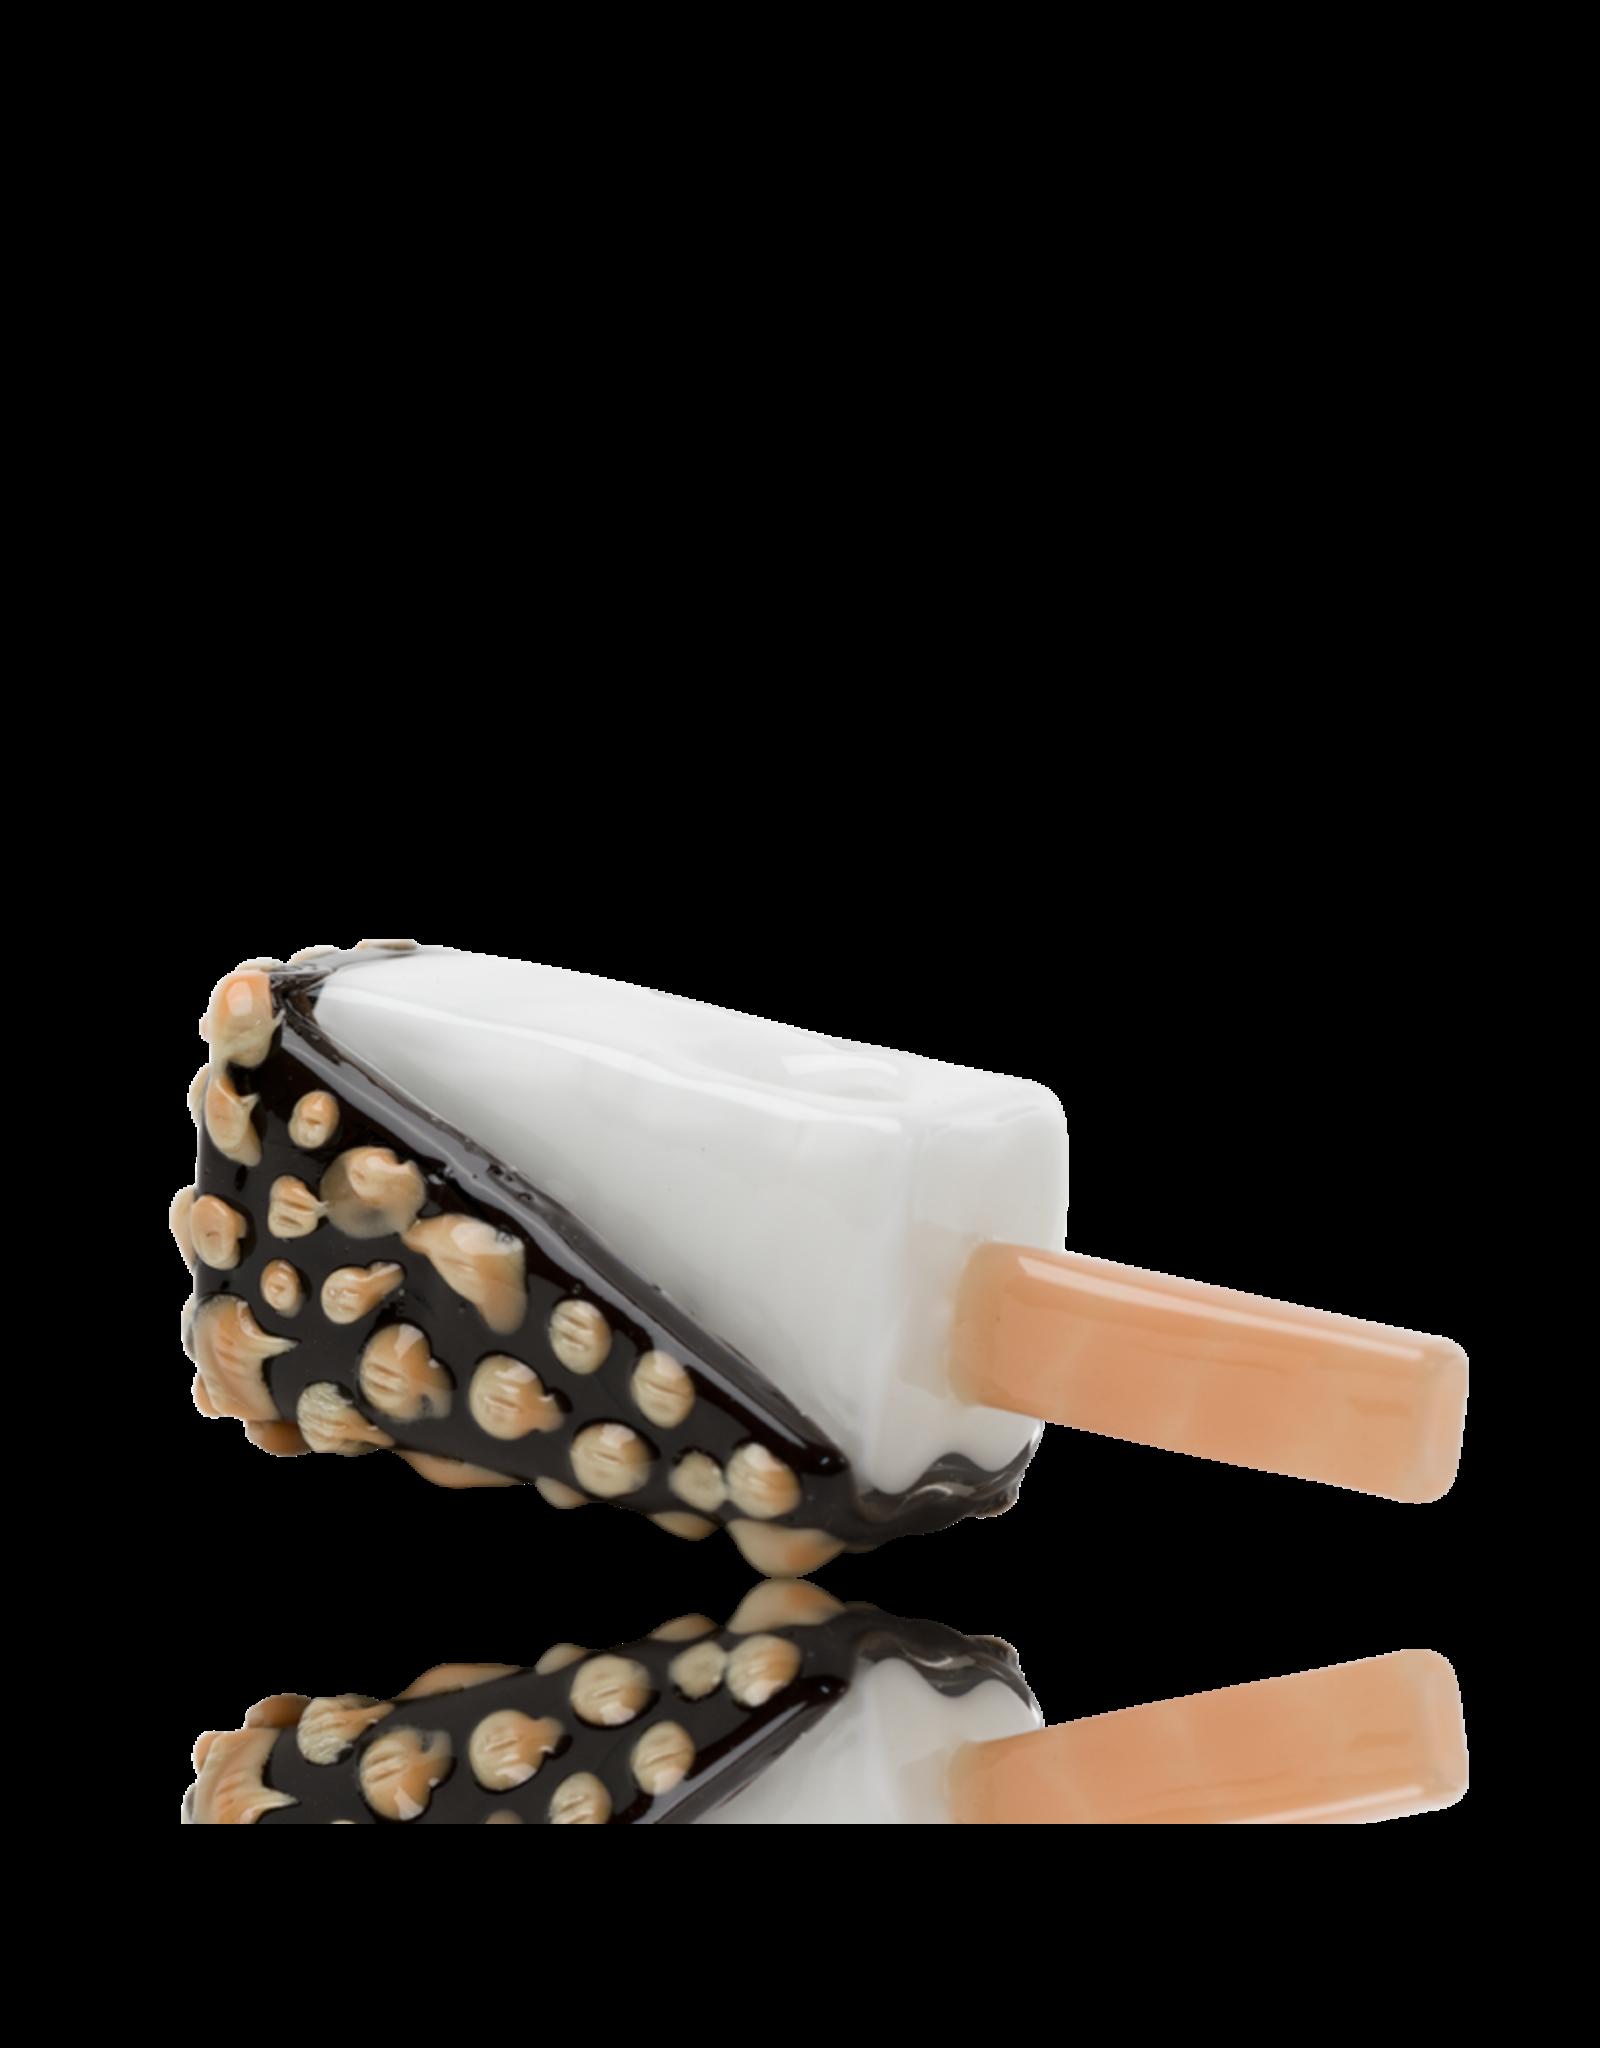 Empire Glass Hazel-Nug Popsicle Hand Pipe